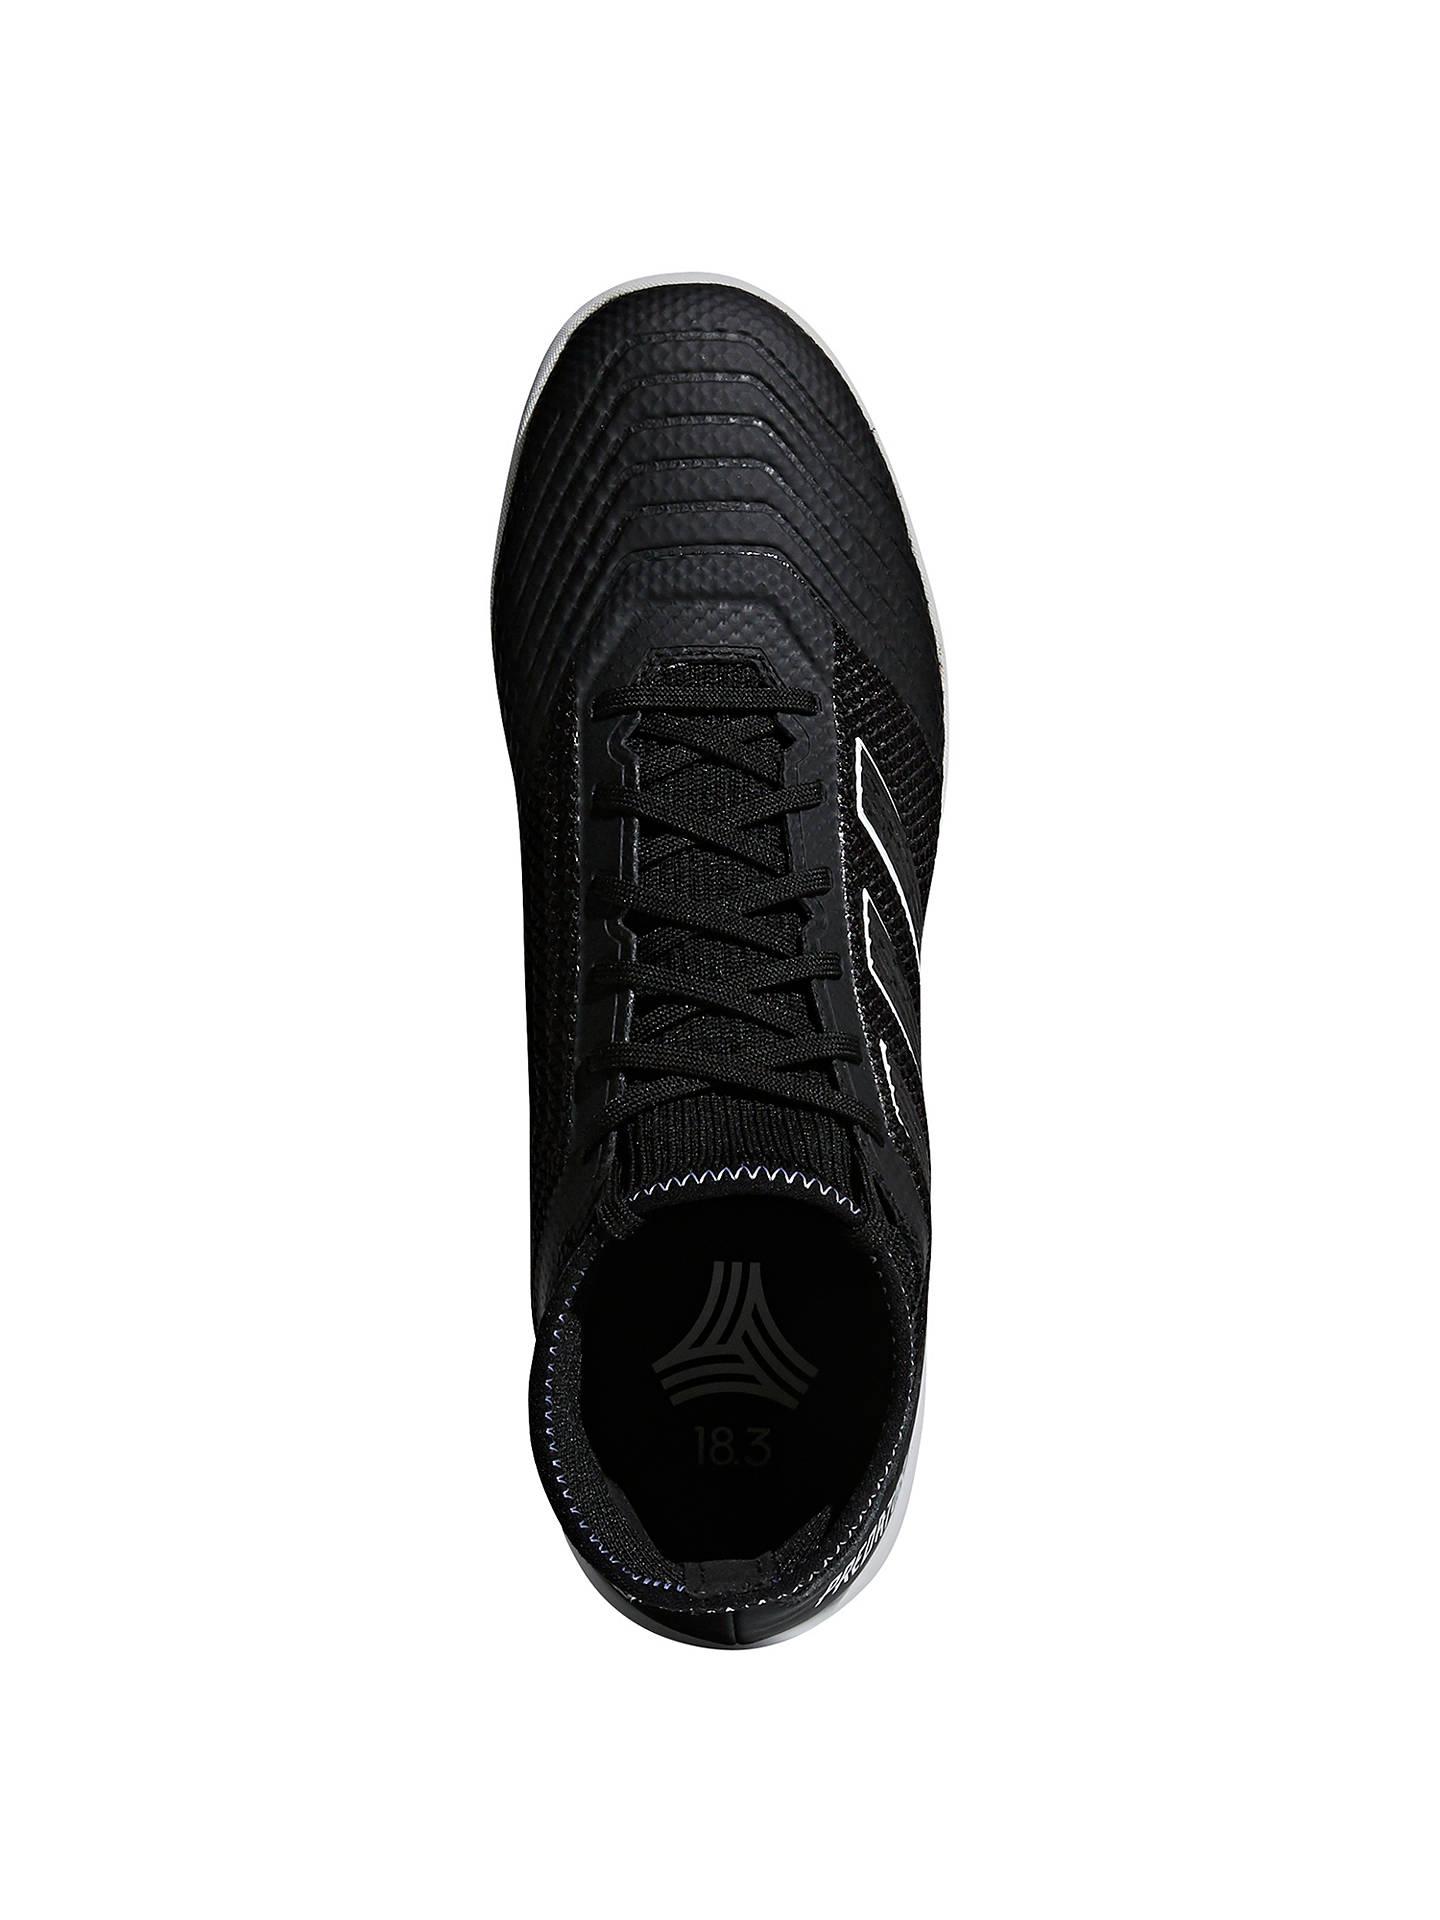 2e1115d53 ... Buy adidas Predator Tango 18.4 Men's Artificial Turf Football Shoes,  Core Black, 7 Online ...